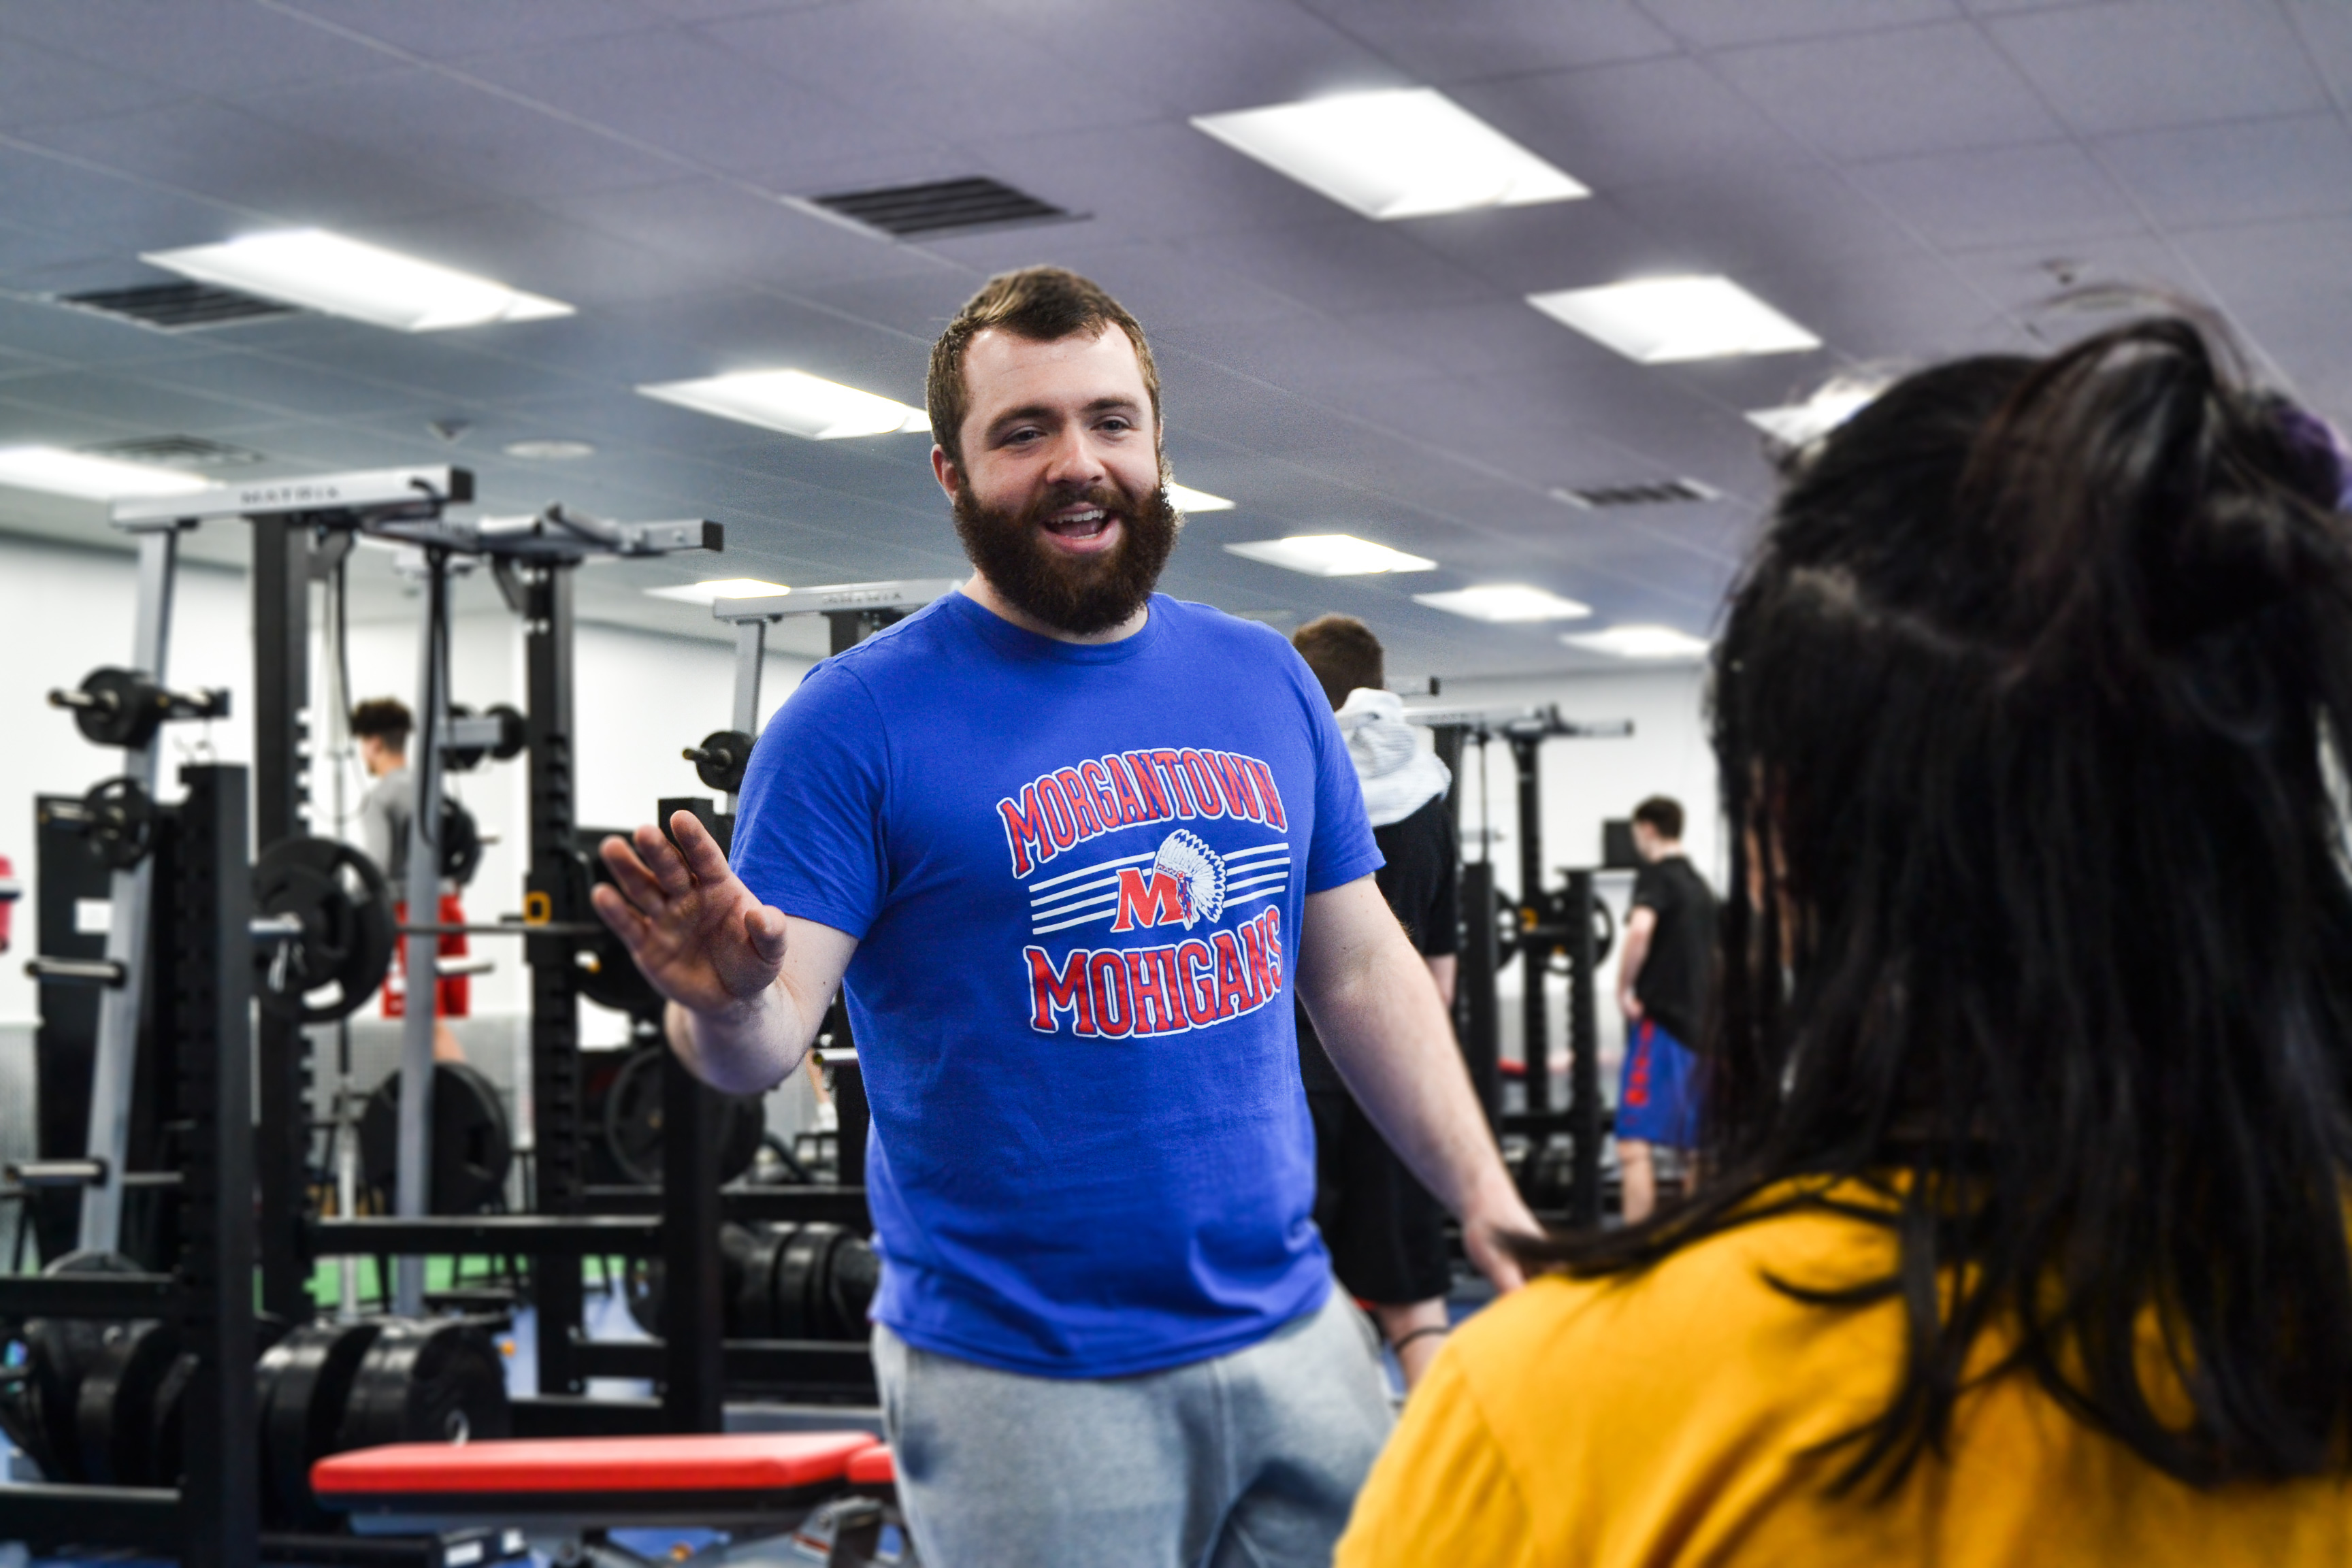 STORY PITCH: WVU CPASS graduate assistants help train local high